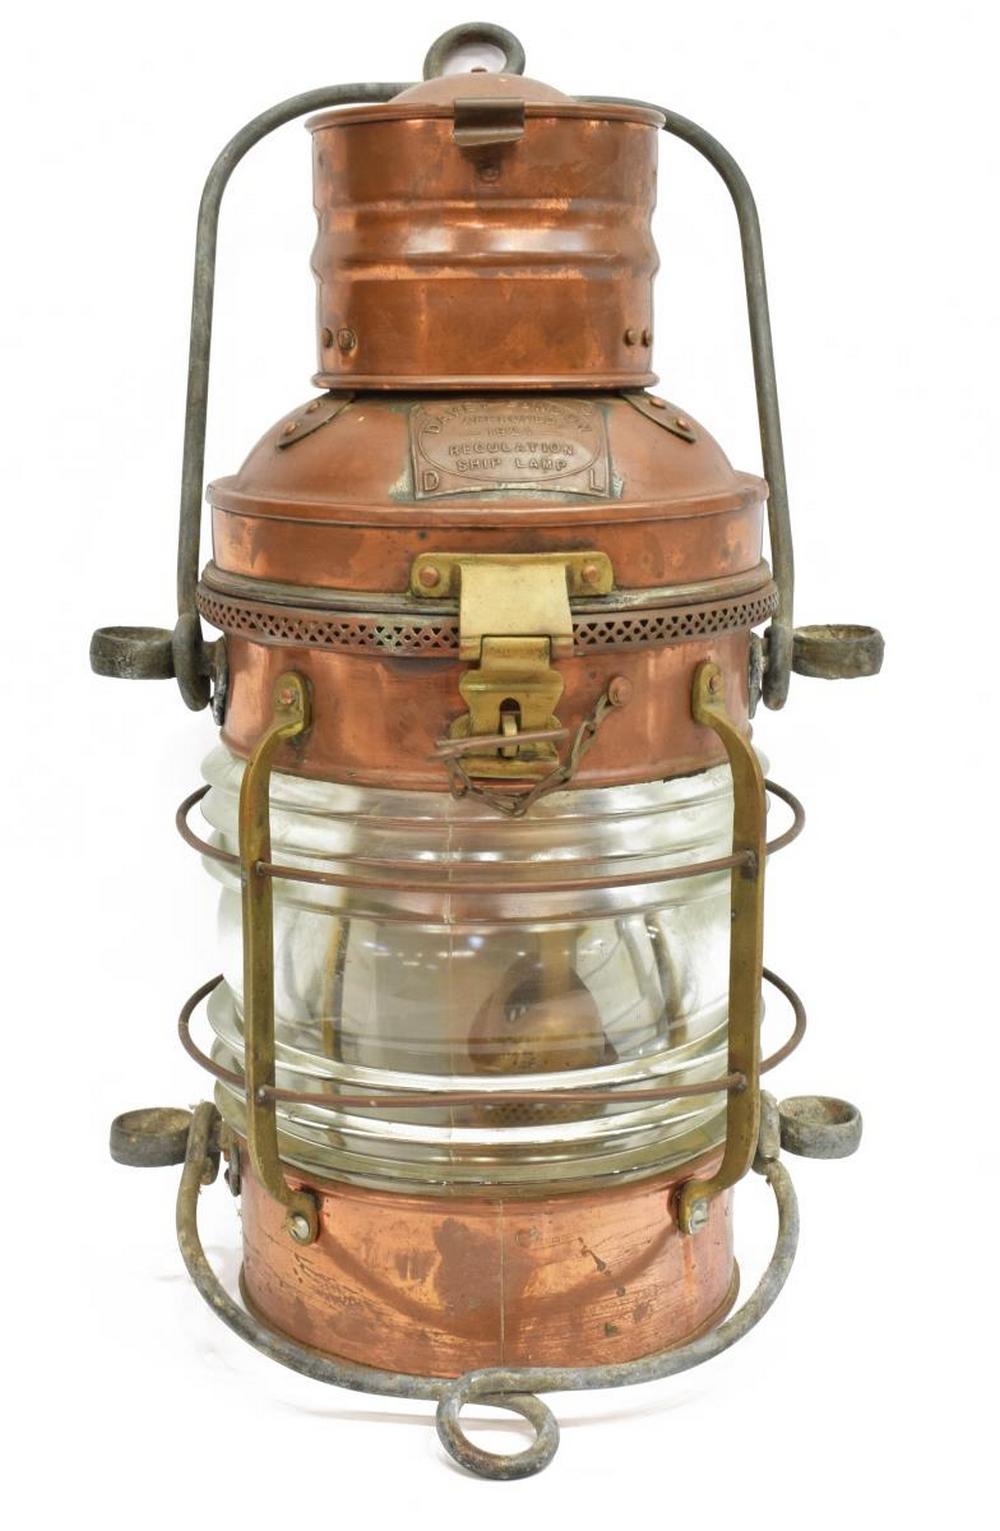 DAVEY 1924 REGULATION COPPER SHIPS LAMP LANTERN